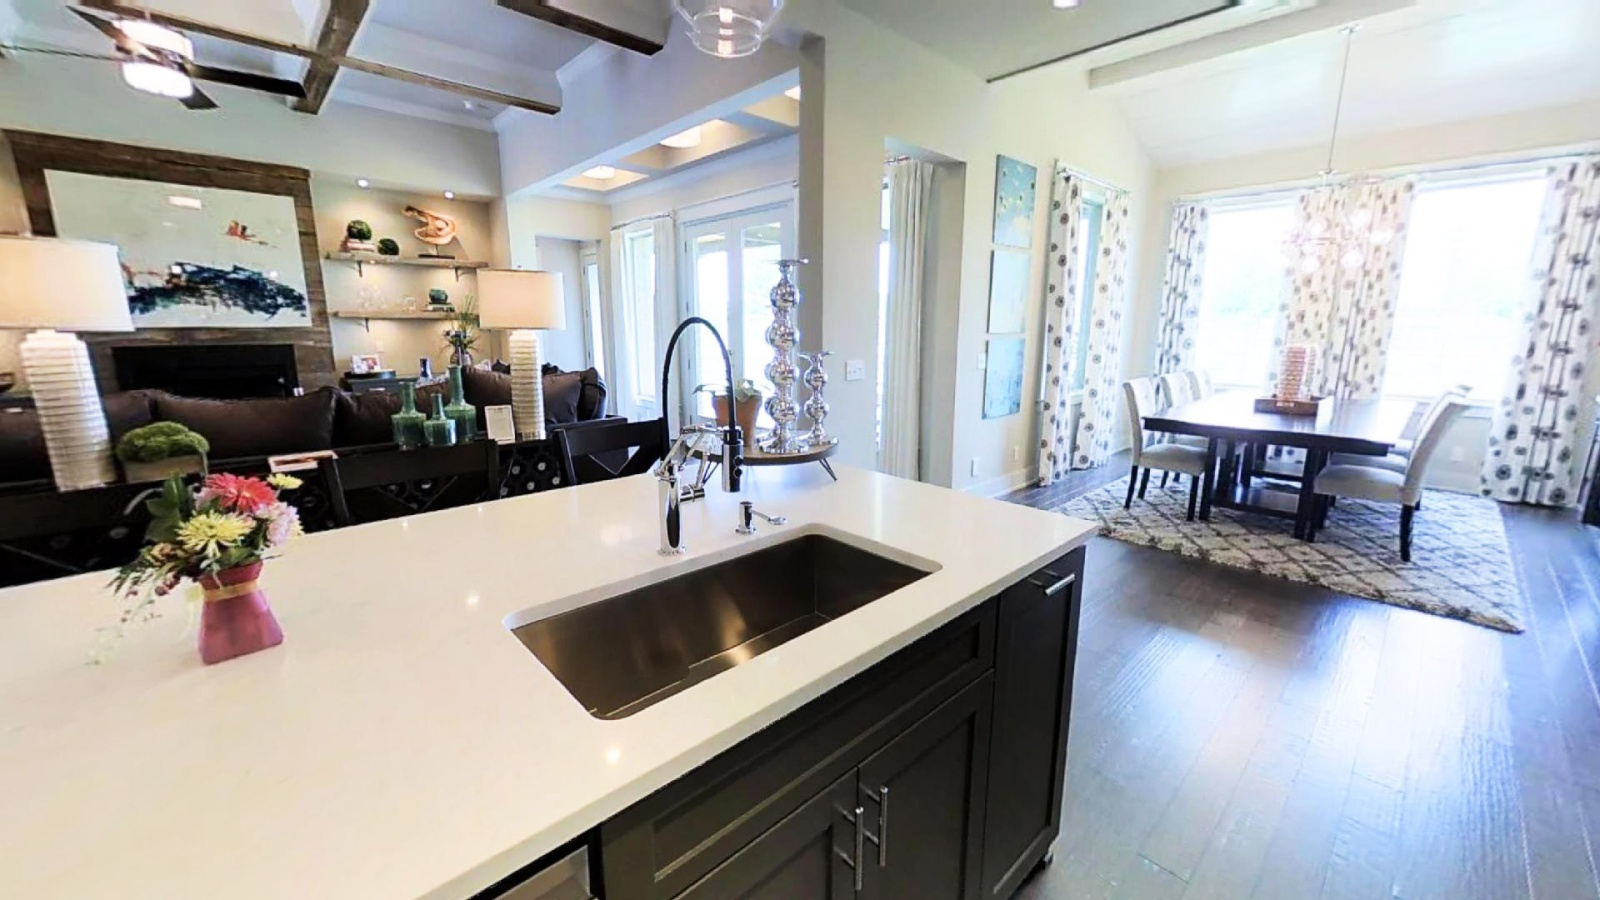 3 Bedrooms Bedrooms, ,3 BathroomsBathrooms,Custom Home,Home Plans,1036